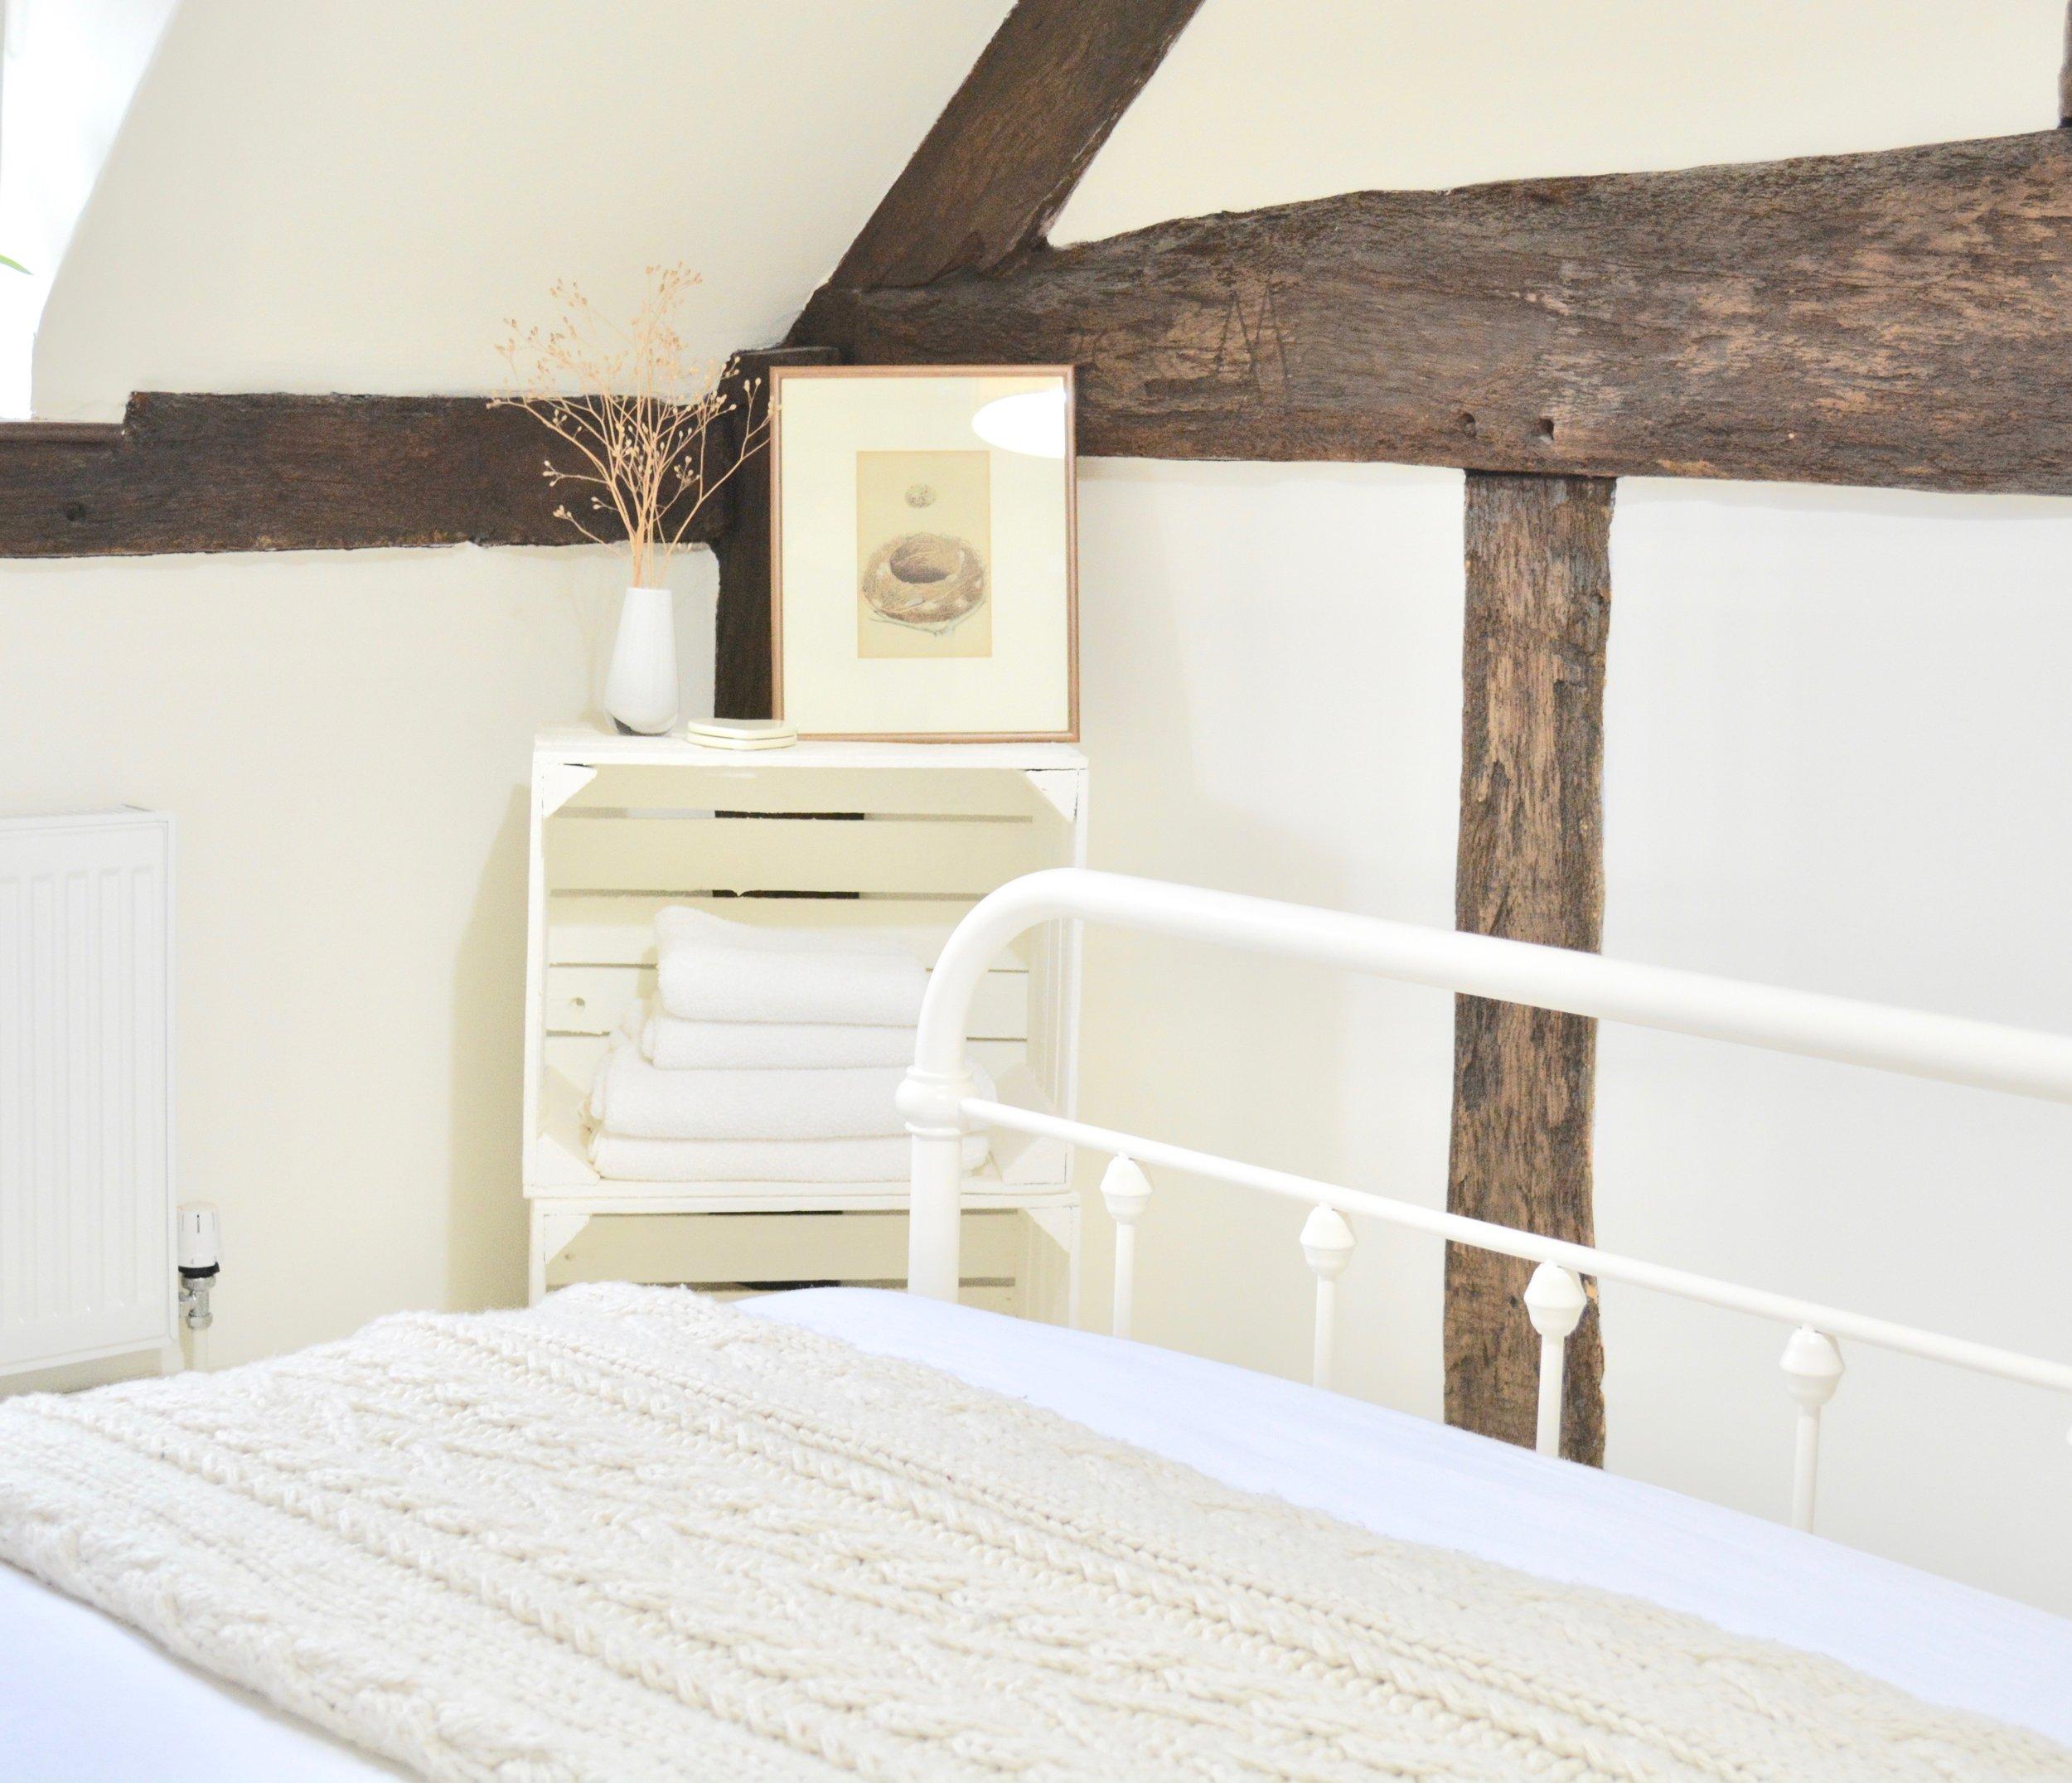 Black & White Cottage Bedroom Designed by www.hlinteriors.co.uk19.jpg